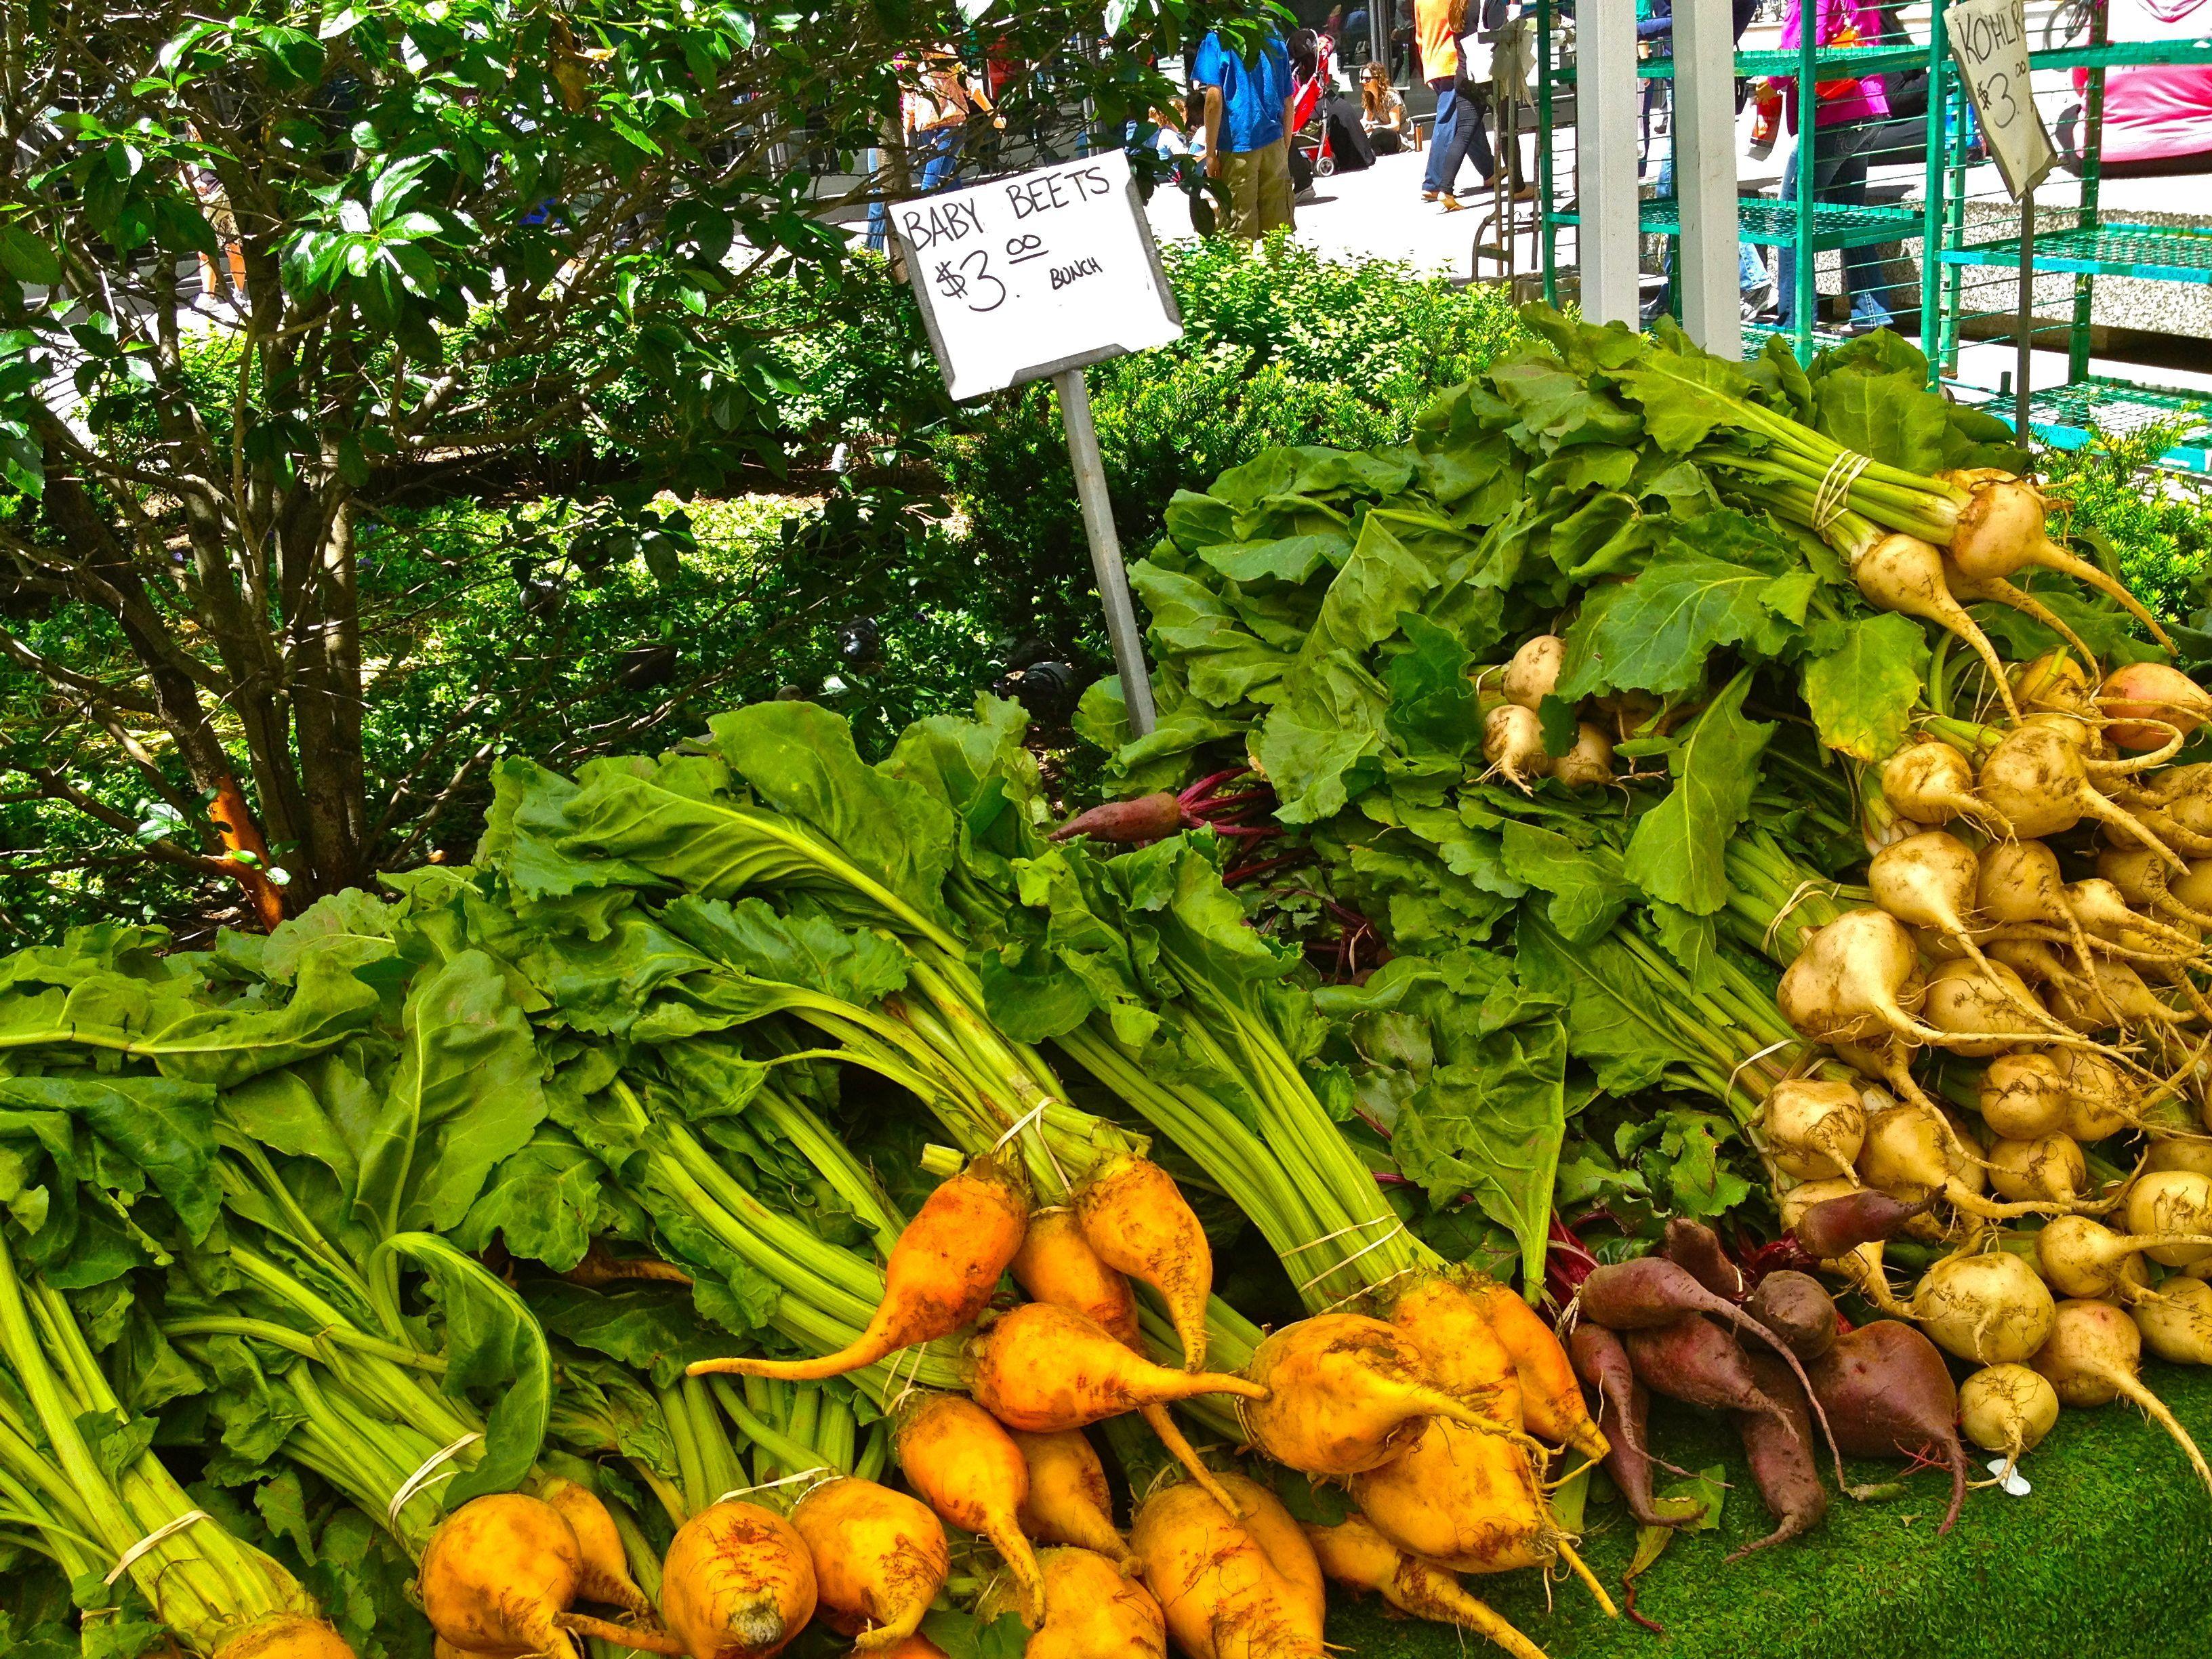 sugar-sweet beets (think beyond the purple) ~ #food #nutrition #vegetables #healthyeating